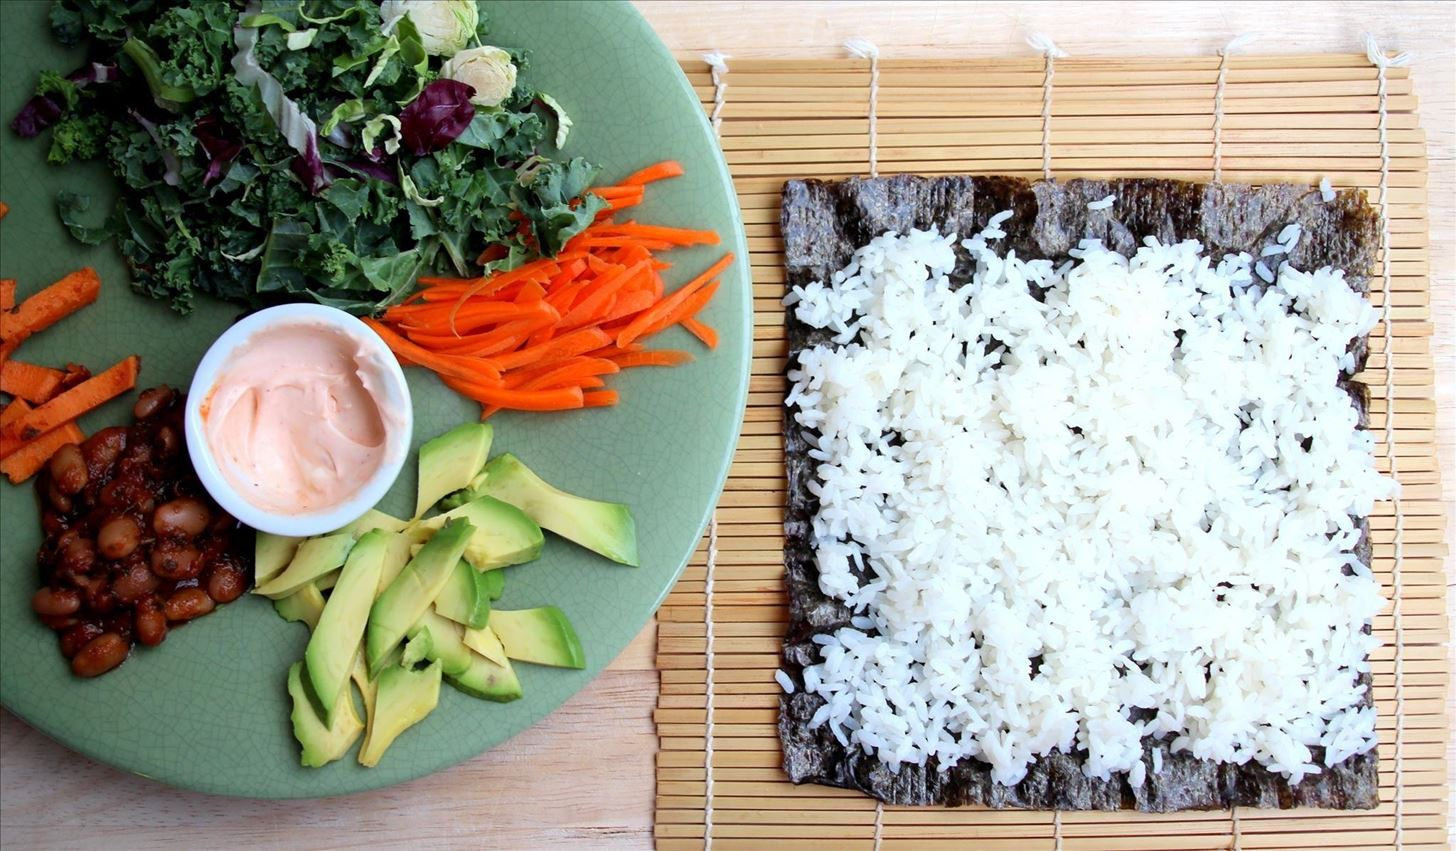 Sushi + Burrito = The Ultimate Handheld Meal